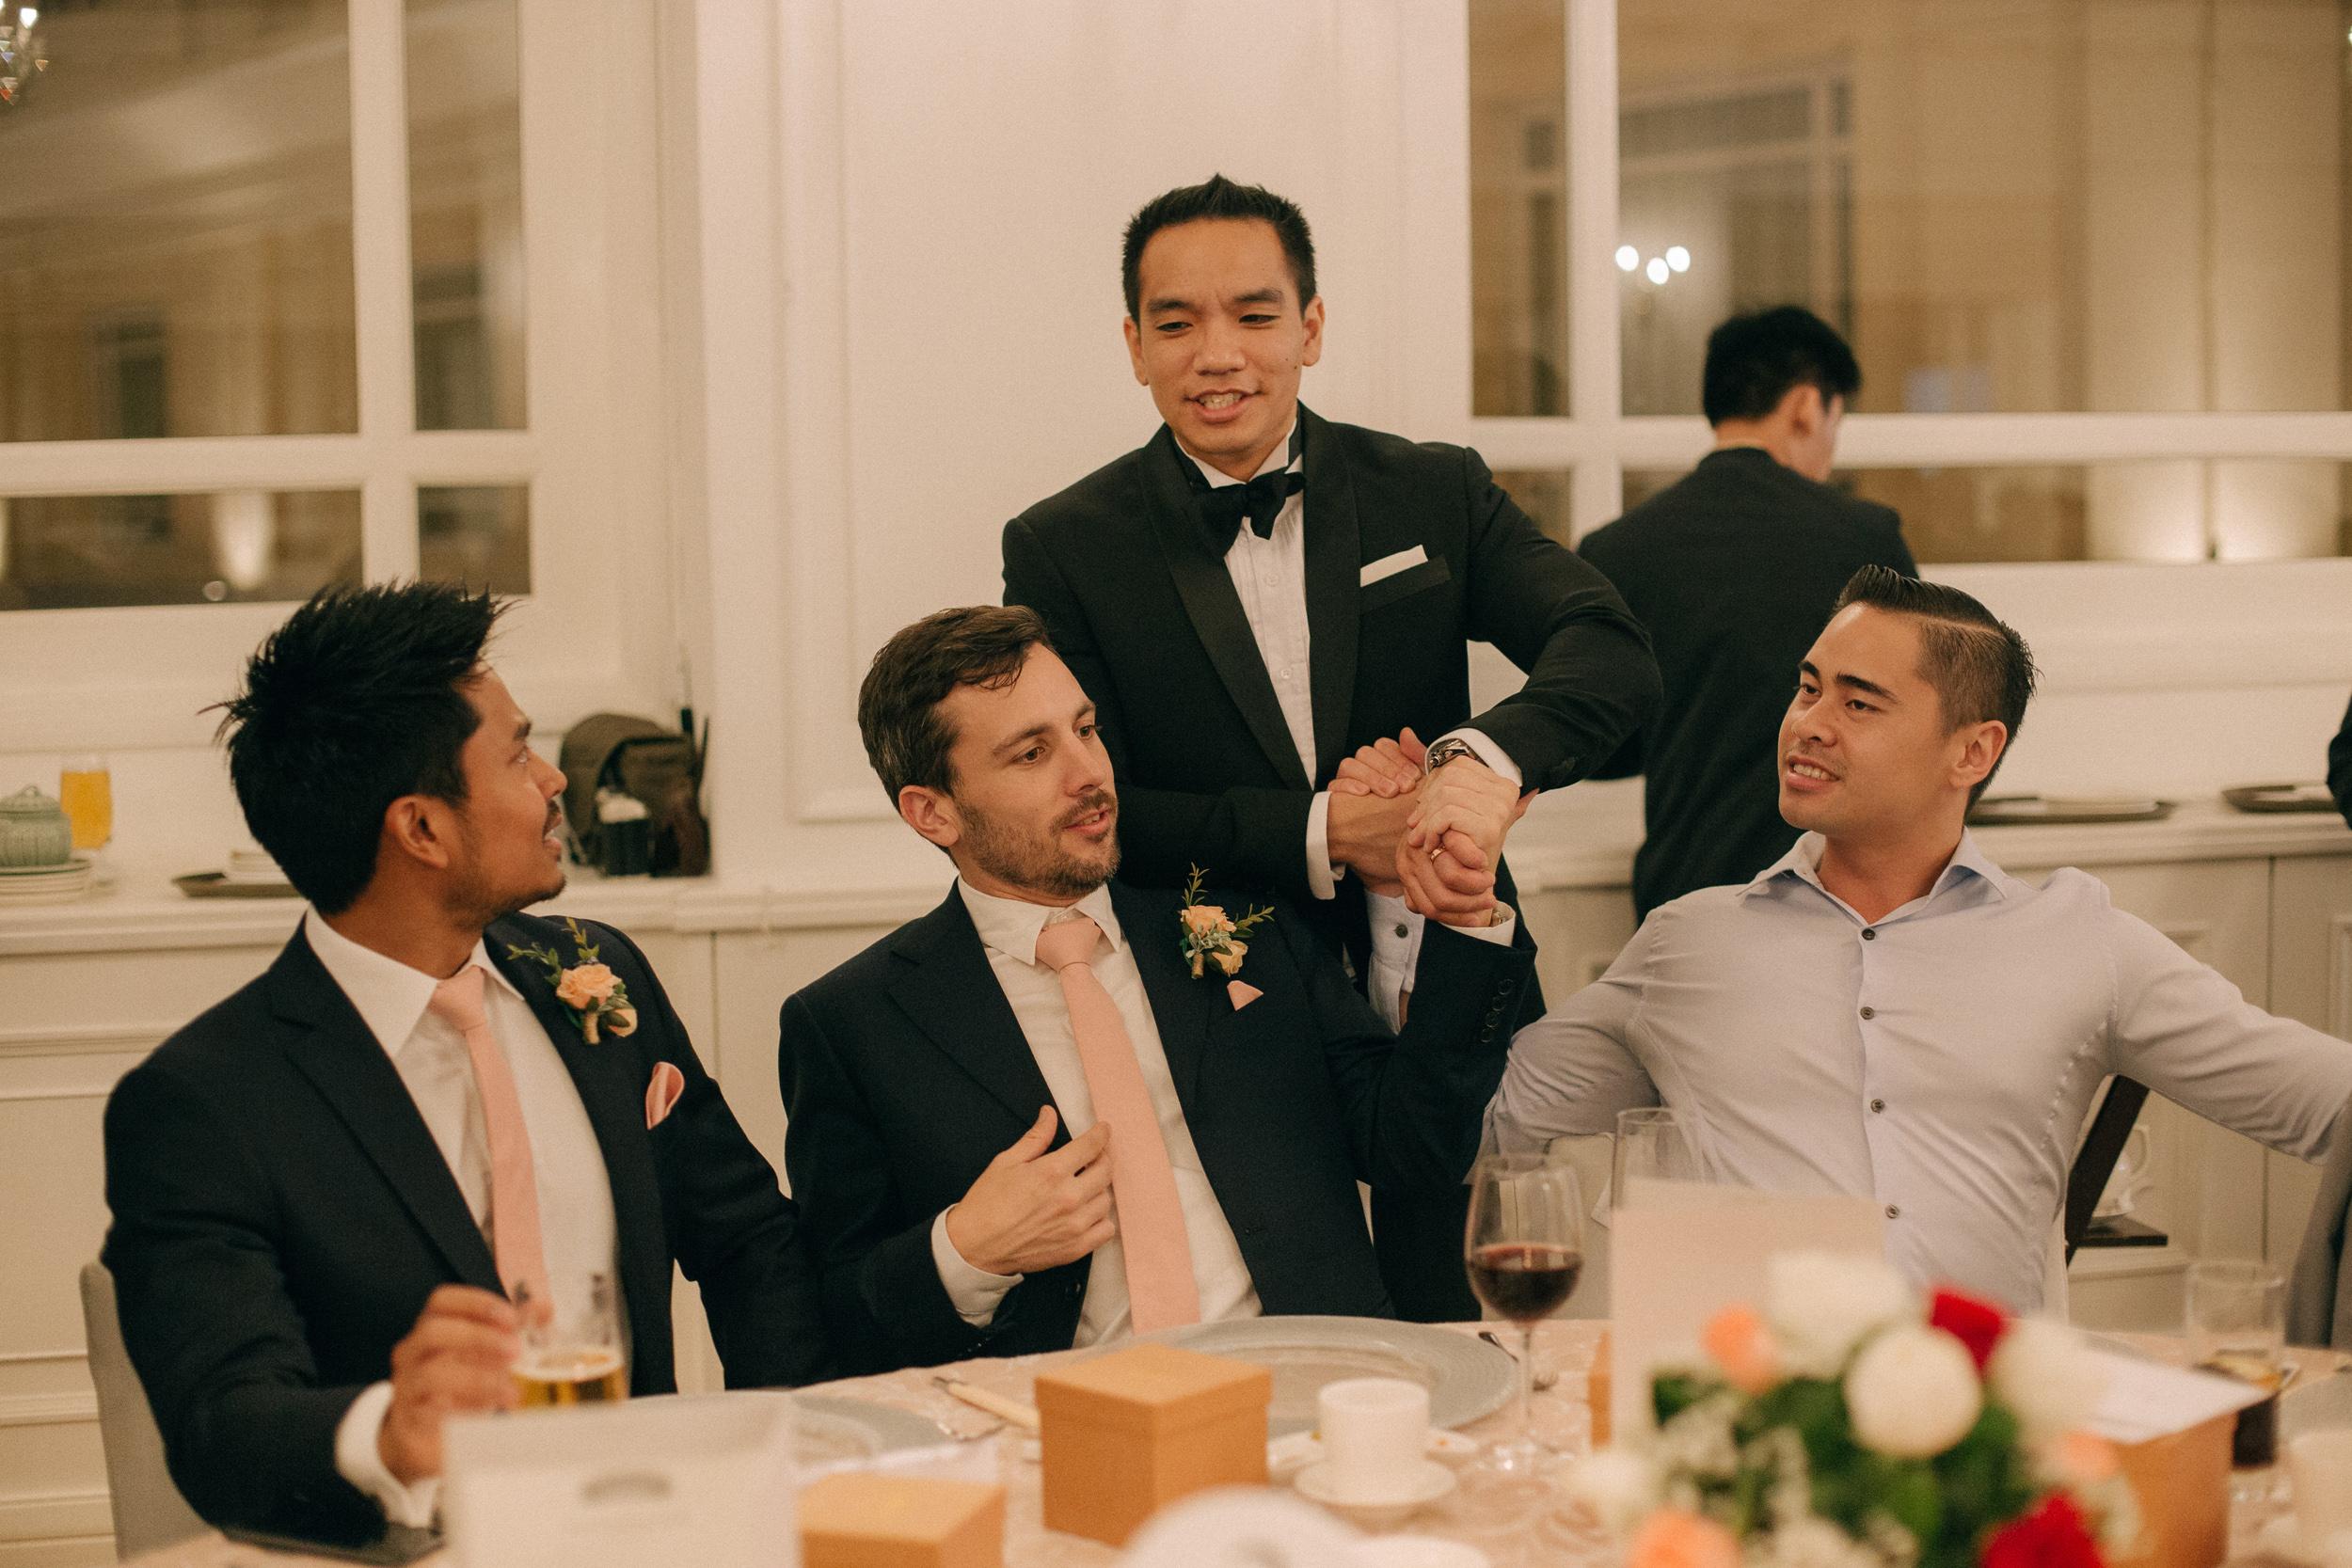 singapore-wedding-photographer-cheryl-matthew-fullerton-hotel-wedding-72.jpg